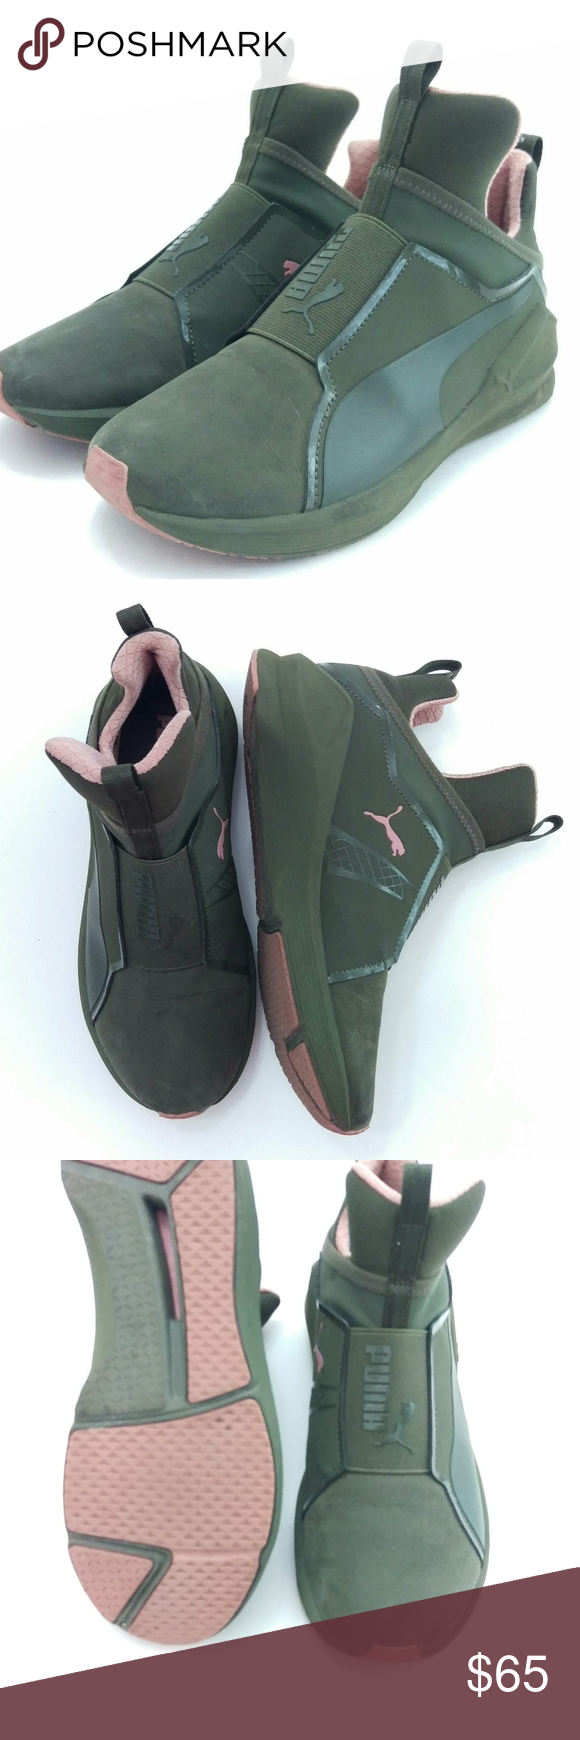 Puma Fierce (Sz 5) olive green and pink